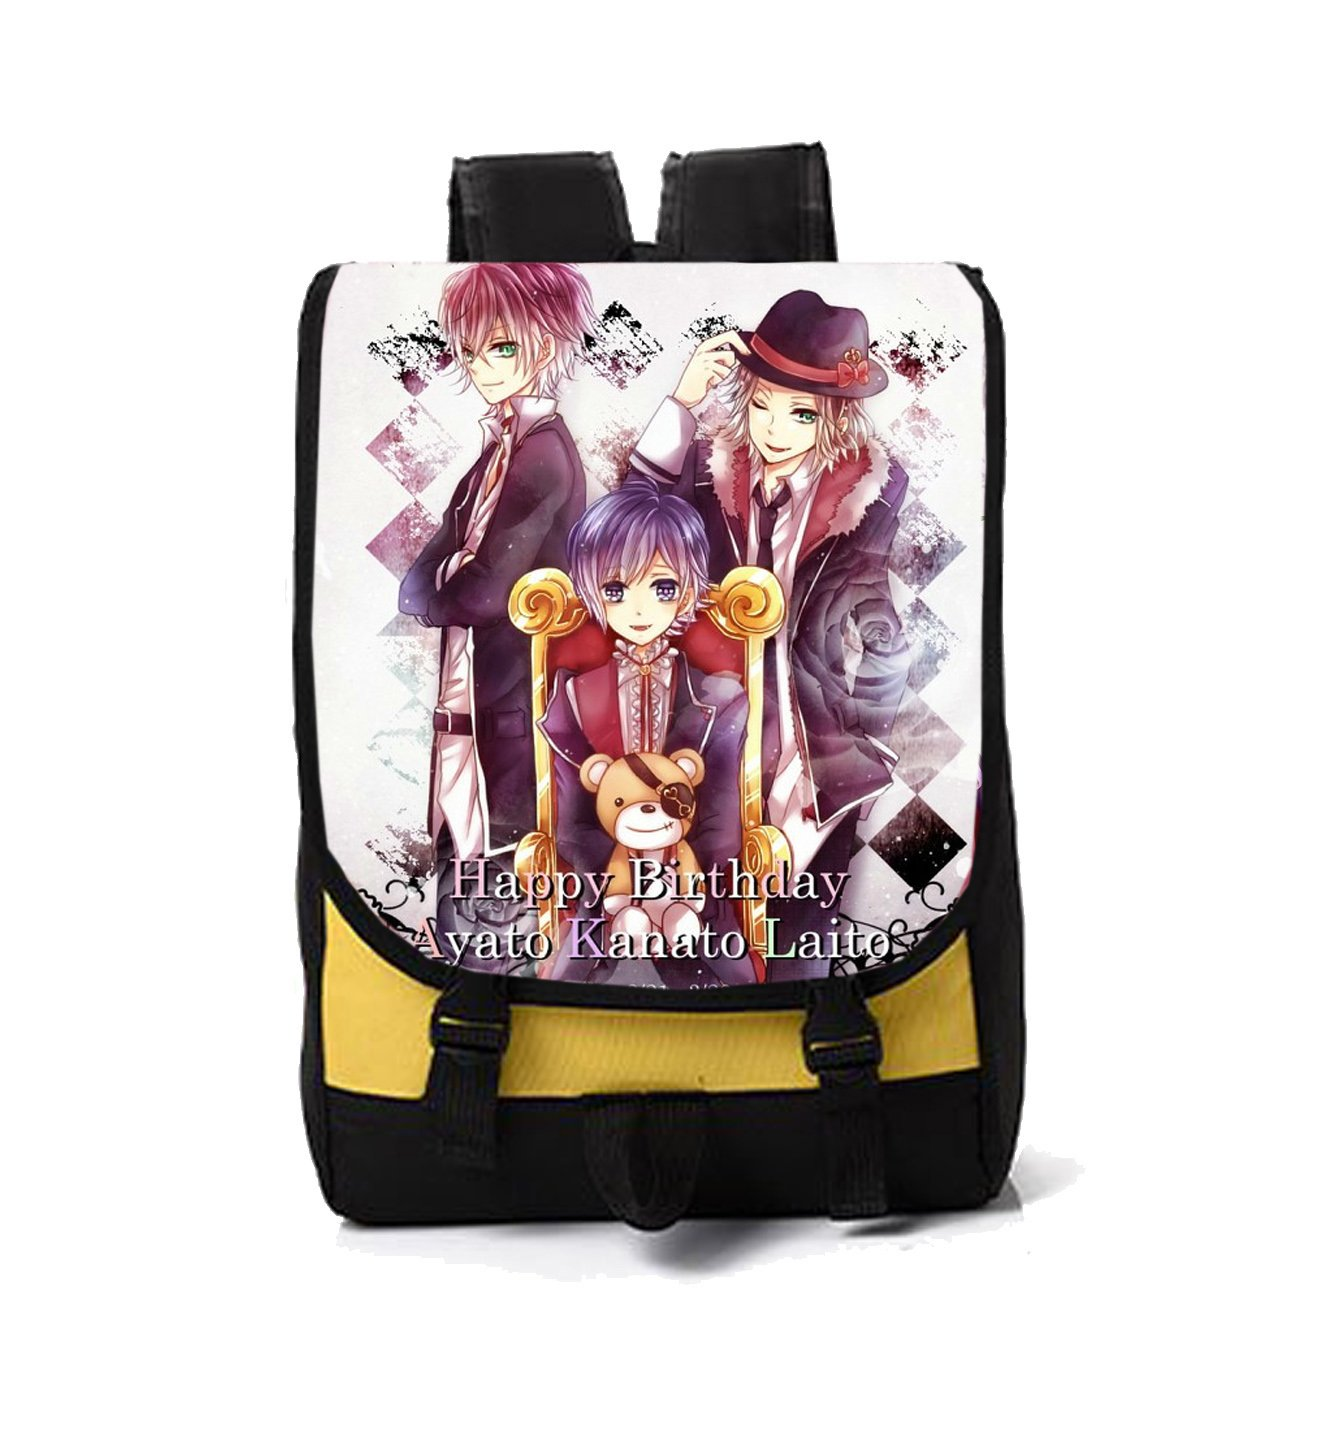 Dreamcosplay Anime Diabolik Loves Logo Backpack Bag Cosplay by Dreamcosplay (Image #1)